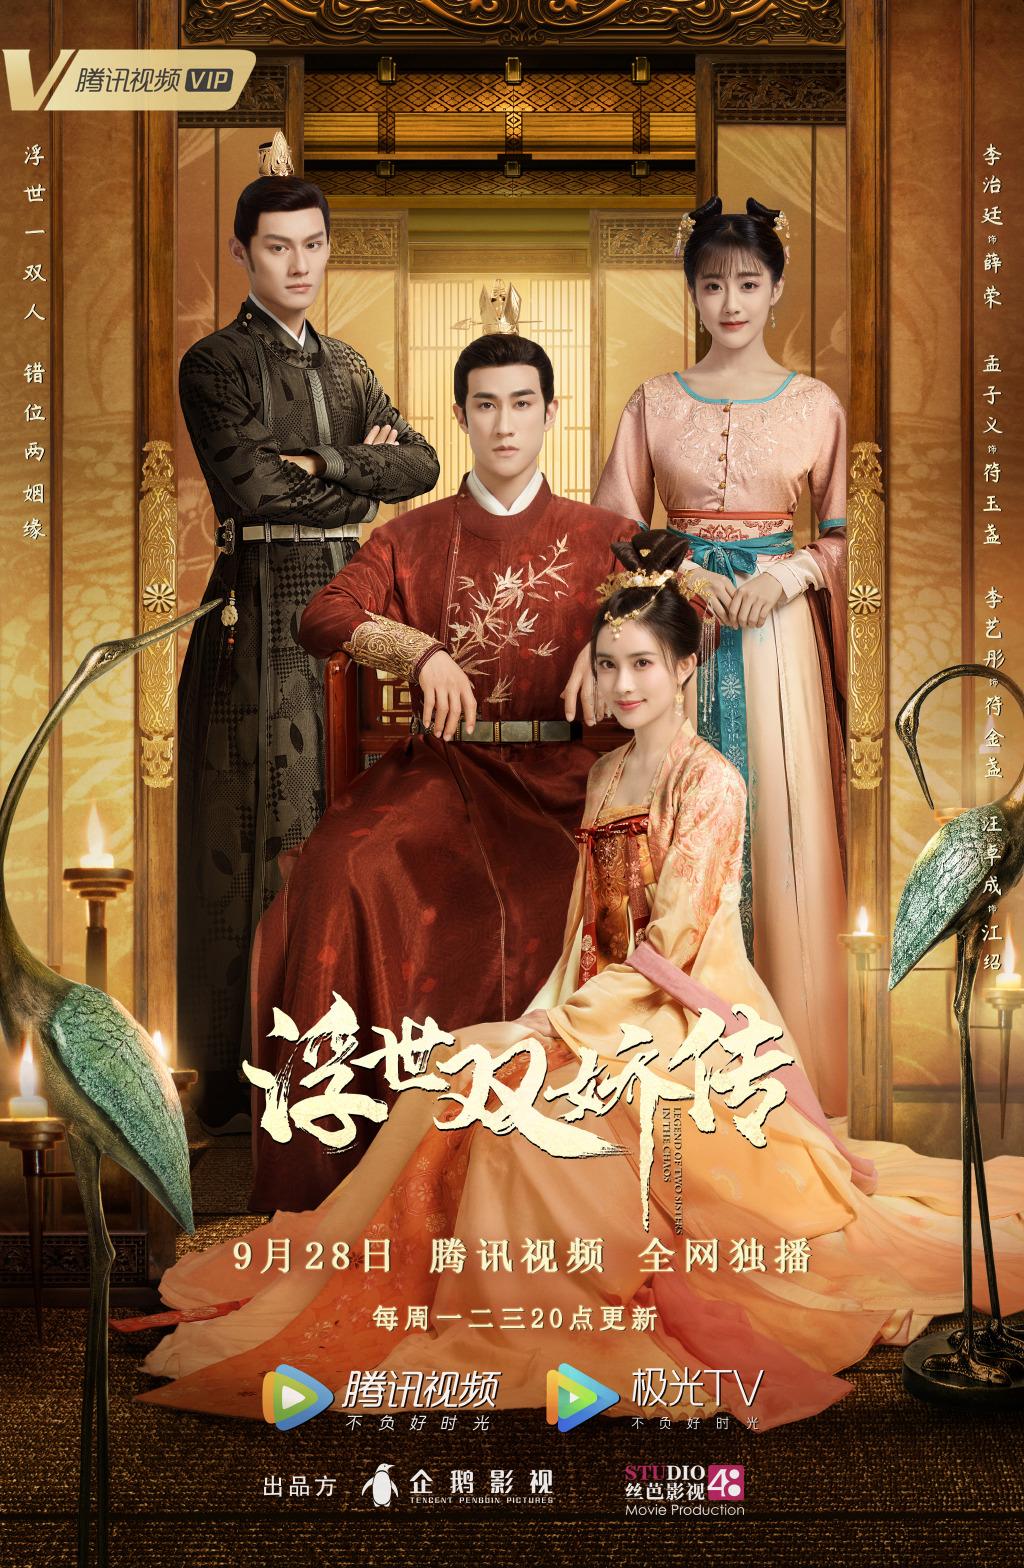 Xem Phim Phù Thế Song Kiều Truyện - Legend of Two Sisters in the Chaos